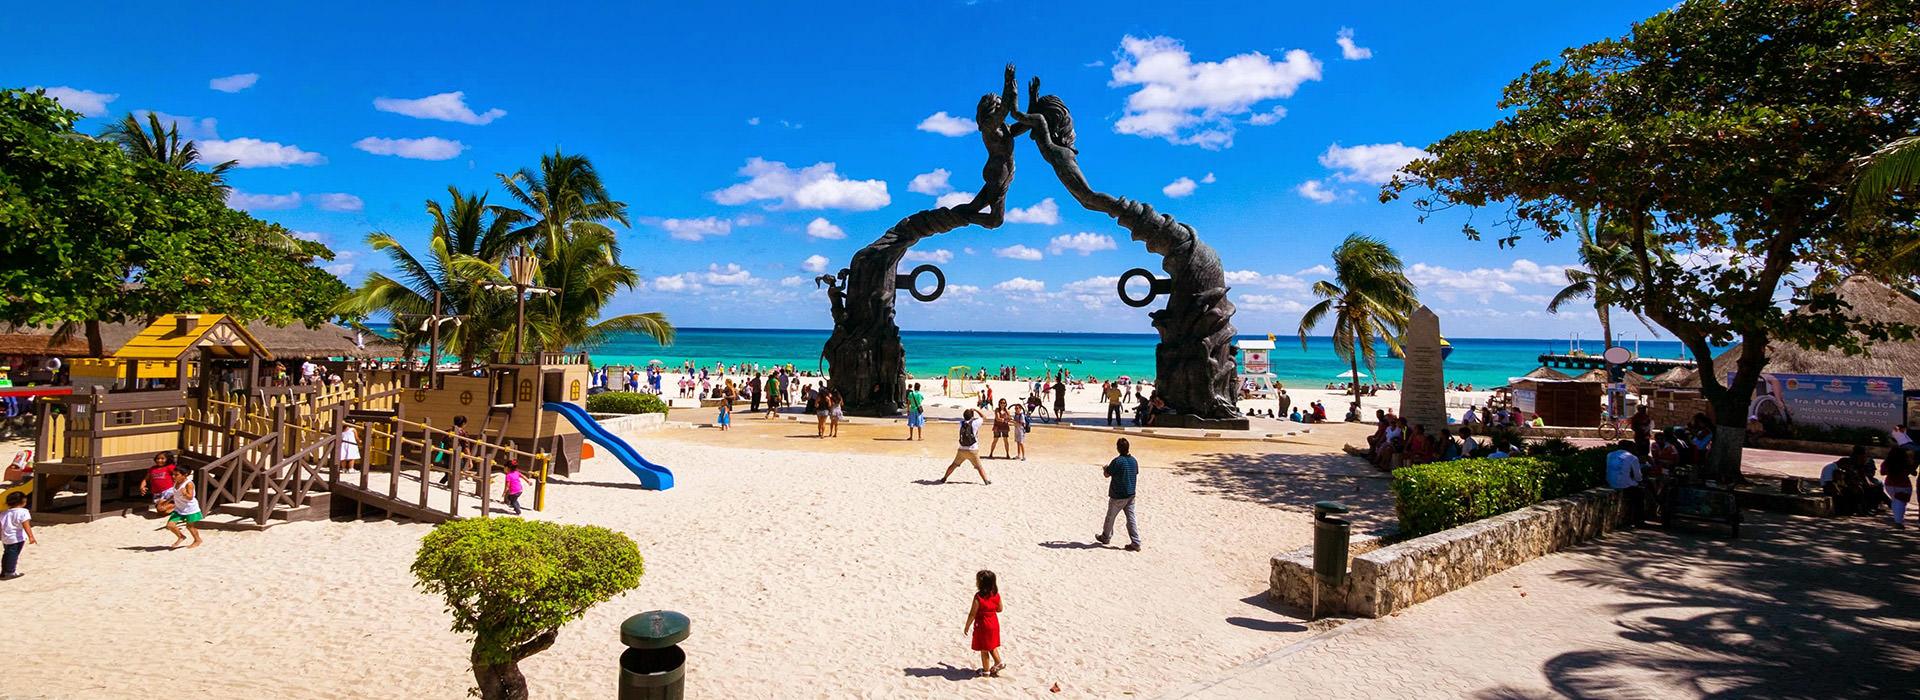 Playa del Carmen - destination photo